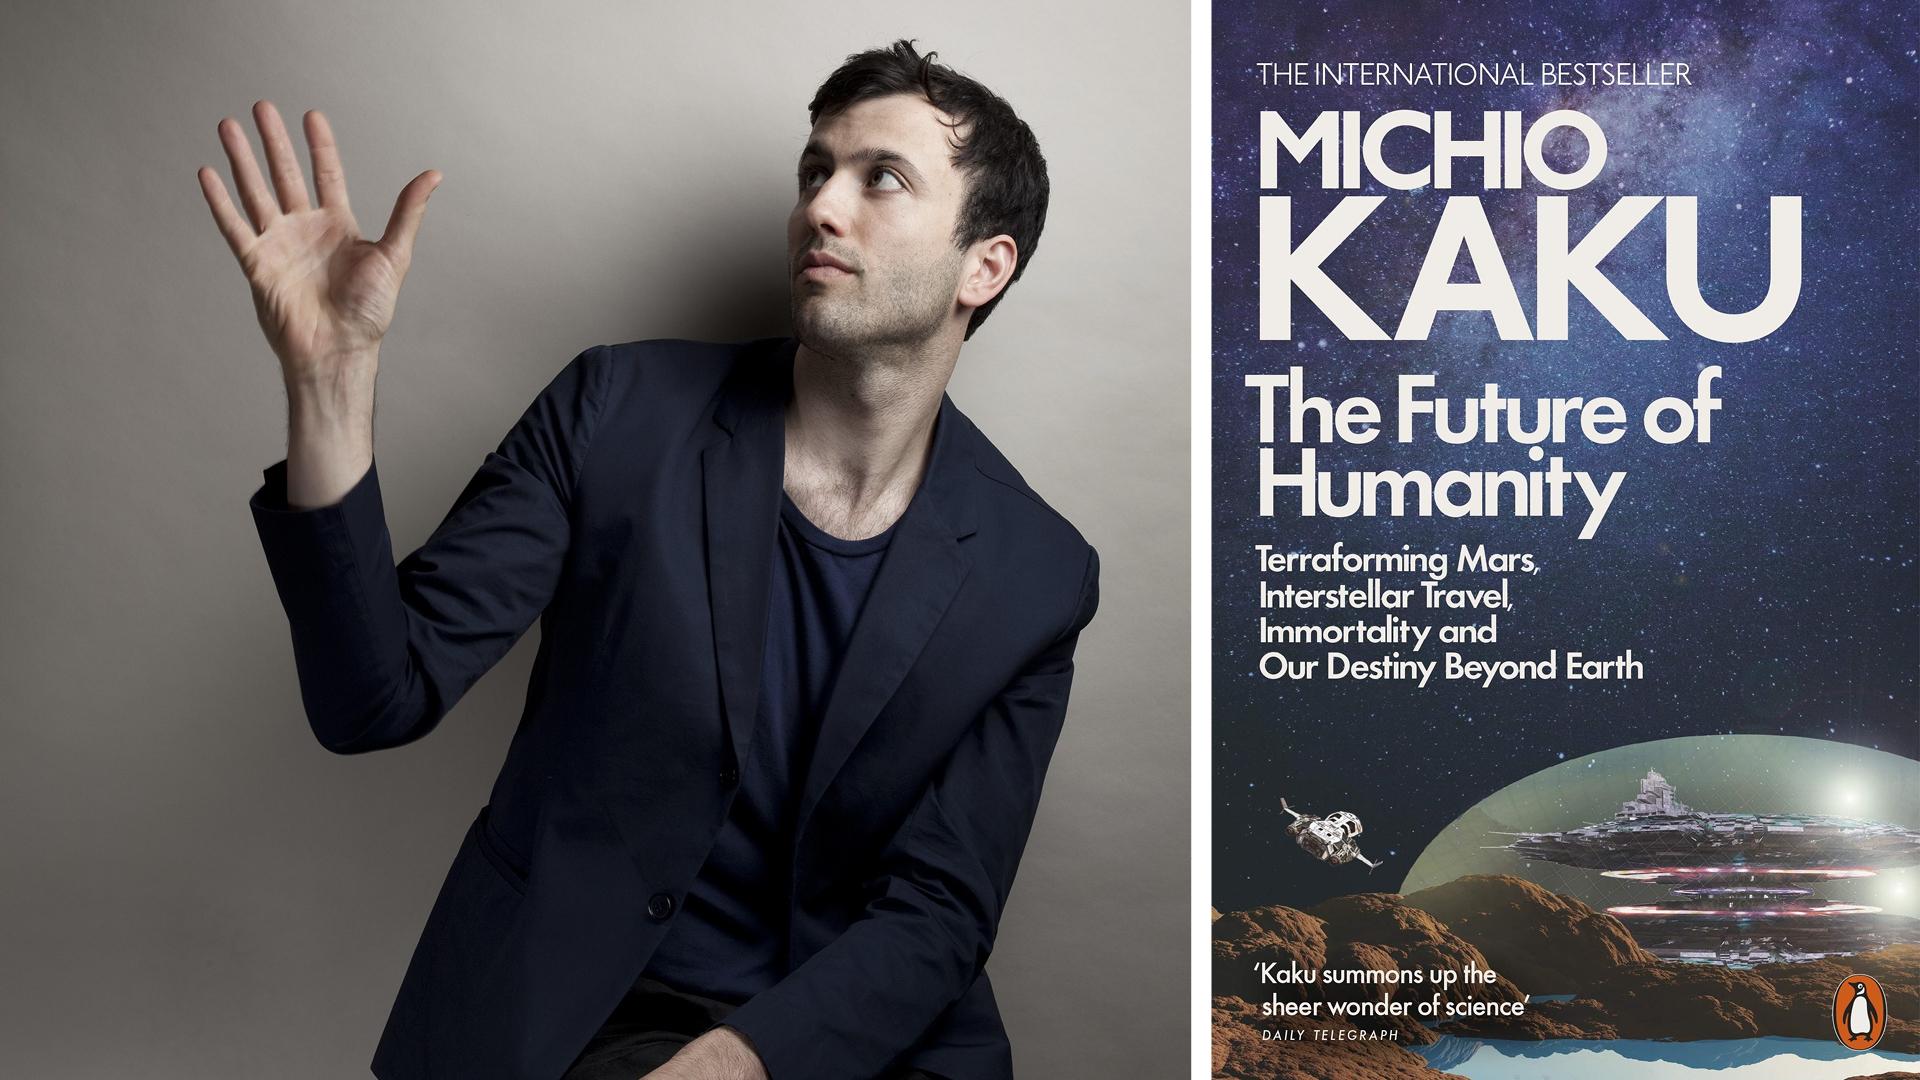 Paul Cocksedge, and the book <i>The Future of Humanity</i>| The Future Of Humanity| Michio Kaku| Paul Cocksedge| STIR